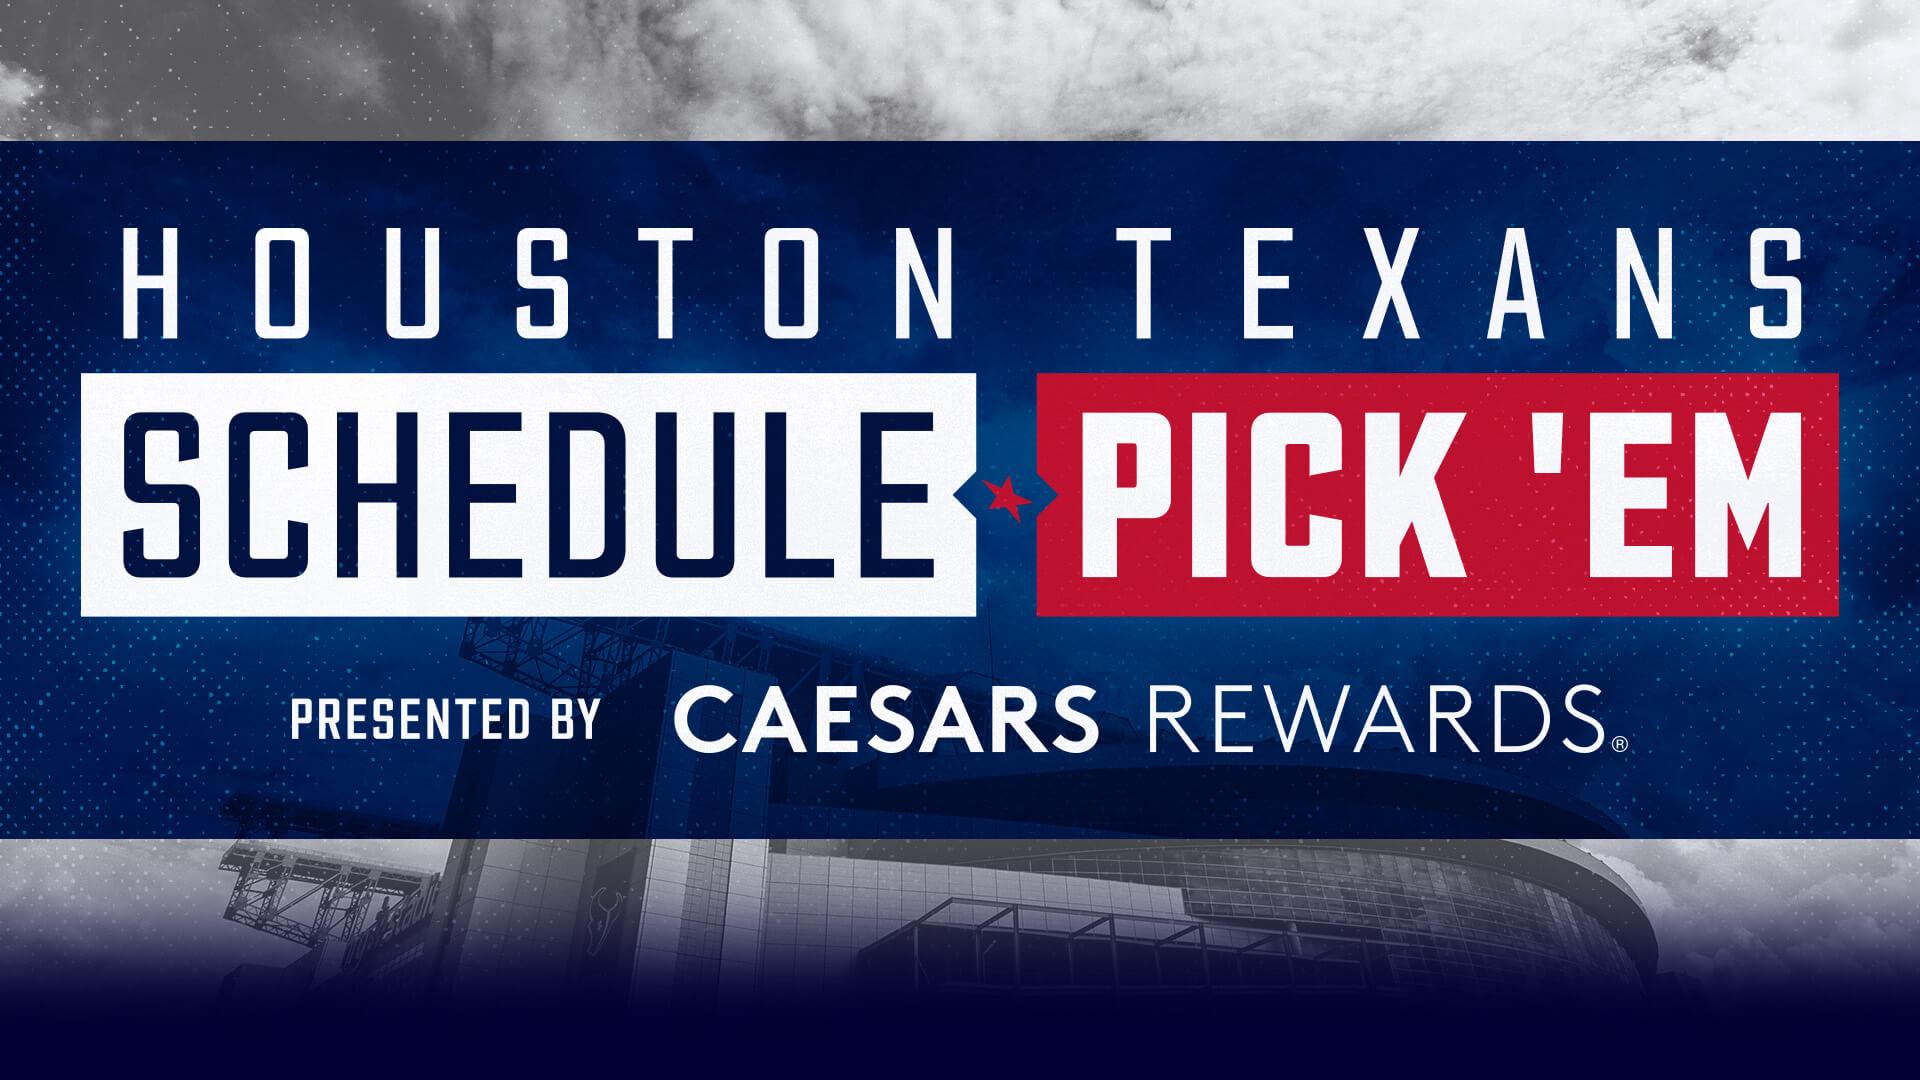 Houston Texans Schedule Pick 'Em presented by Caesars Rewards